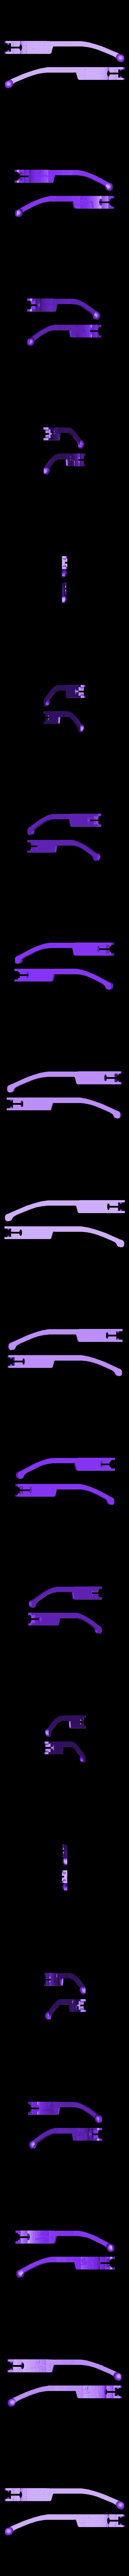 Arms_Curved.stl Download free STL file POP Glasses • 3D printable template, SimonePDA